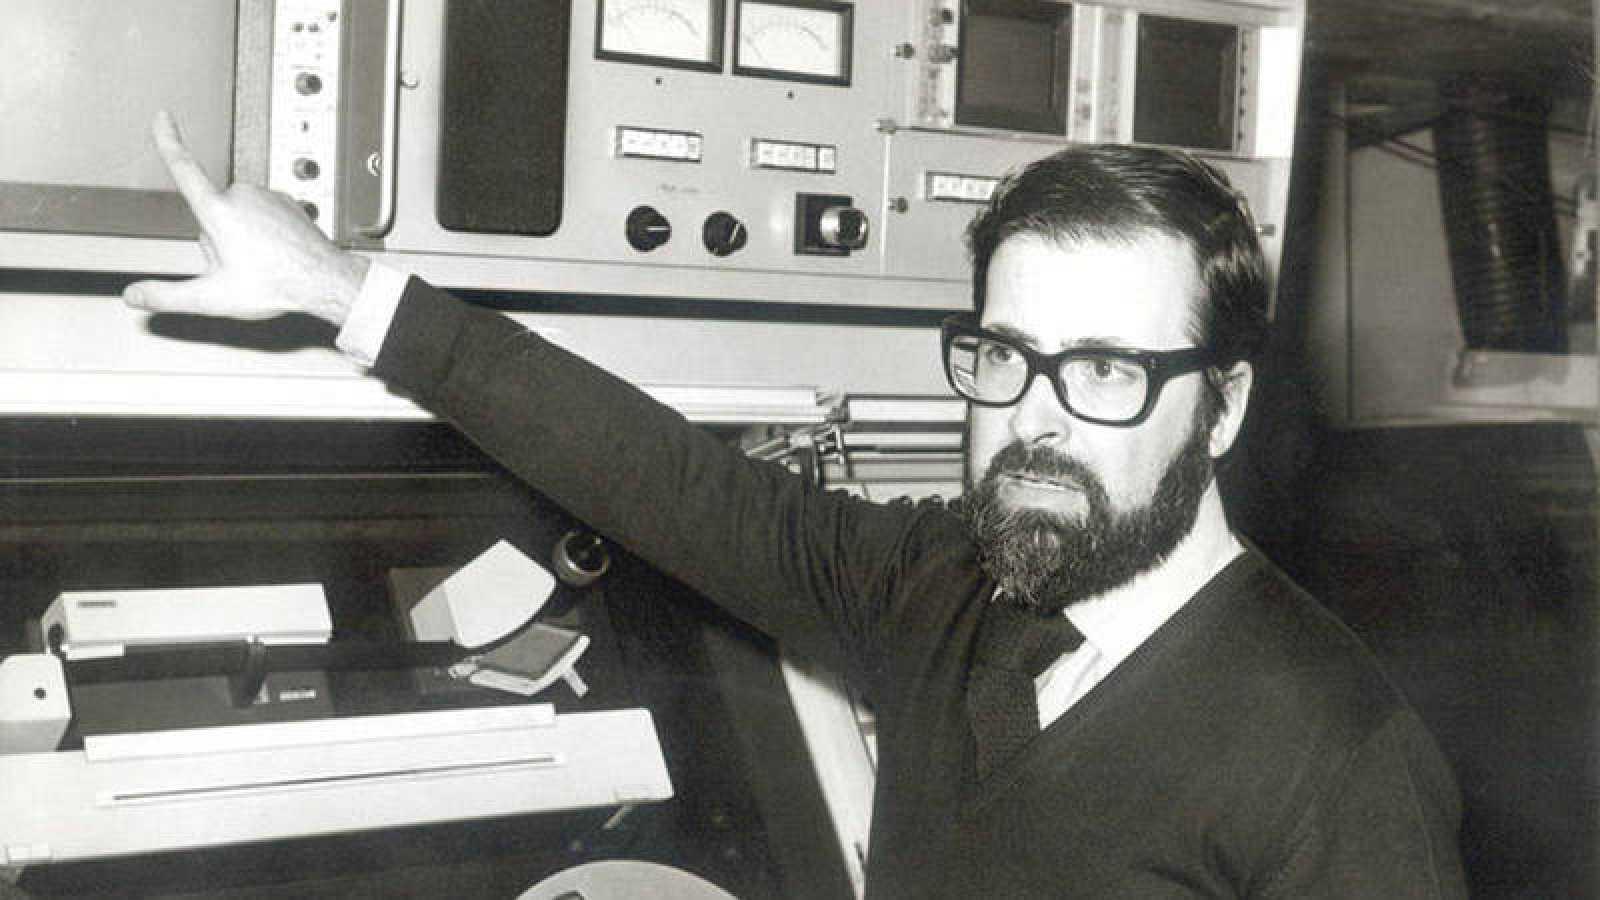 Cineastas, actores, escritores o presentadores de televisión se despiden de 'Chicho' Ibáñez Serrador.